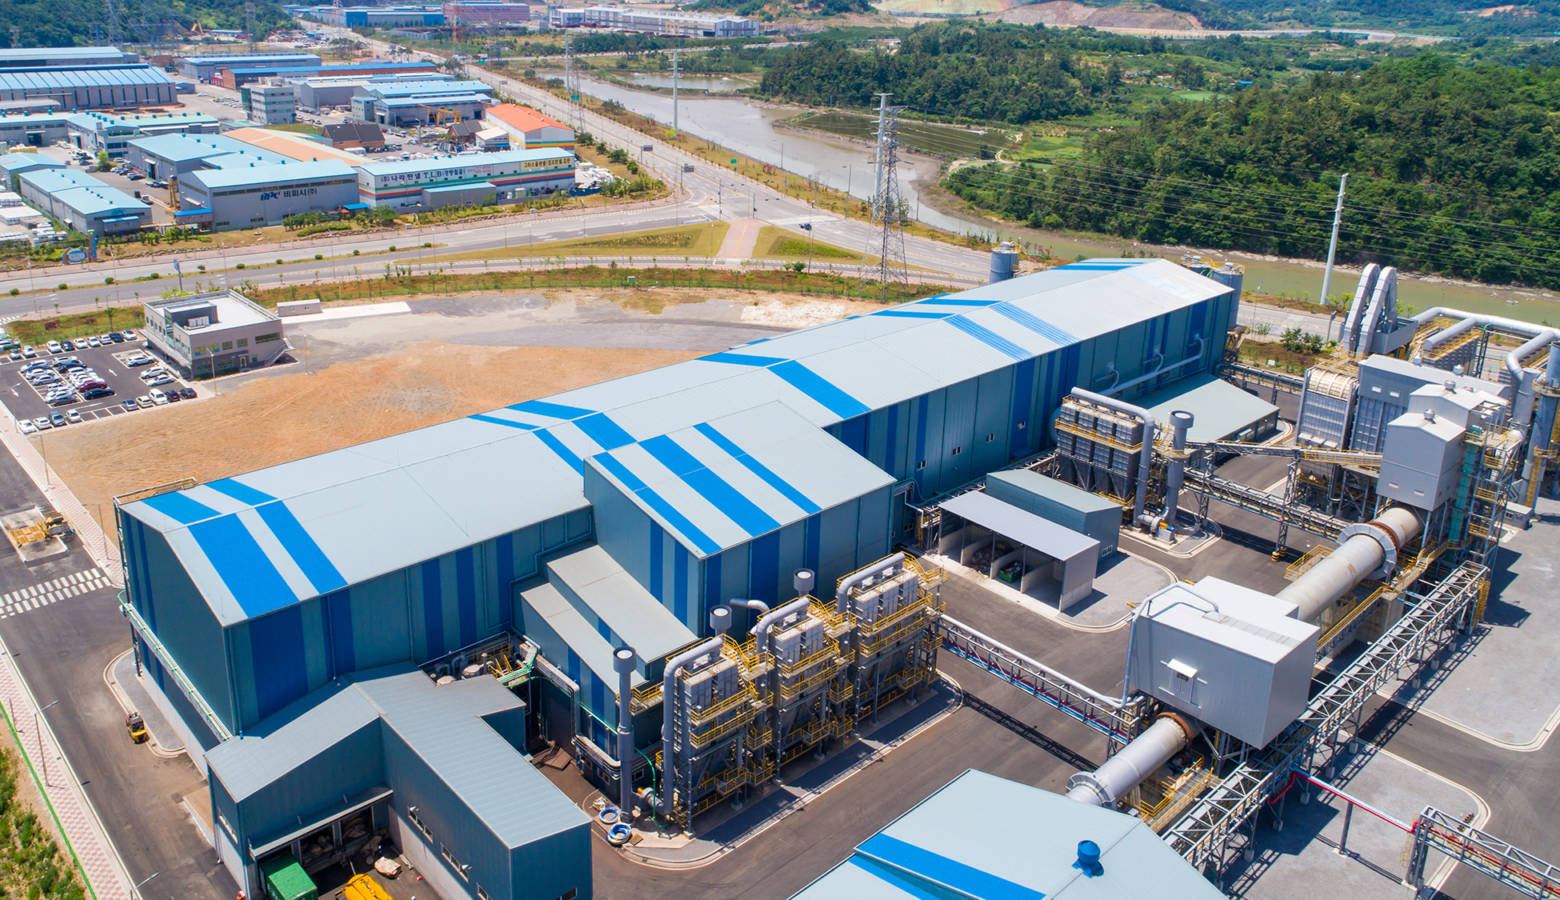 Rendering of Similar Facility